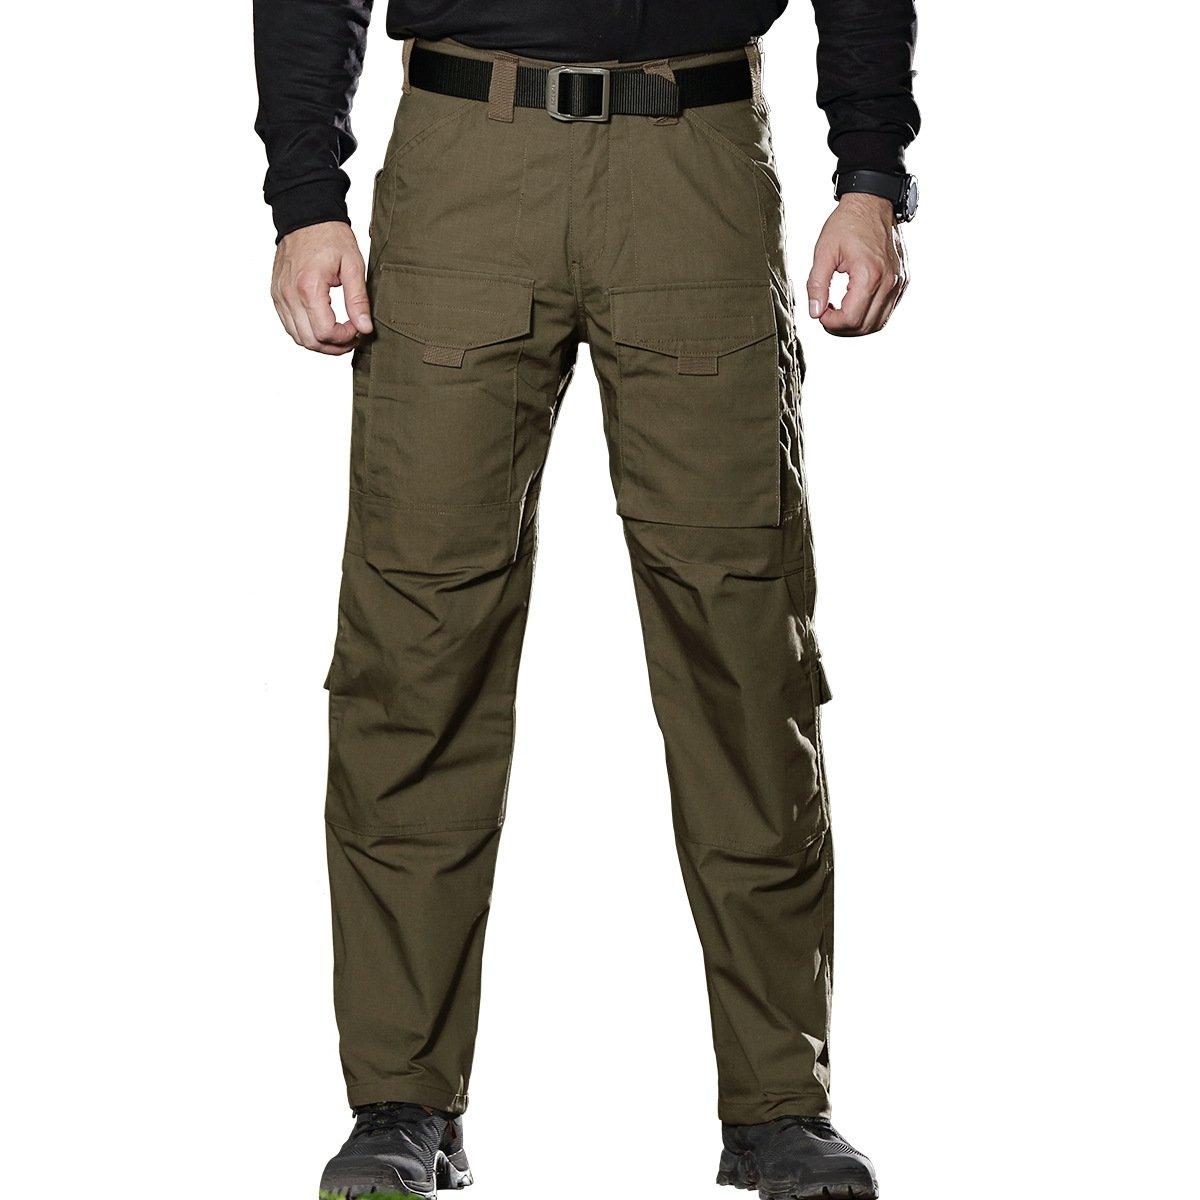 FREE SOLDIER Outdoor Men Multi Pockets Tactical Pants Cargo Pants F & S Co. Ltd